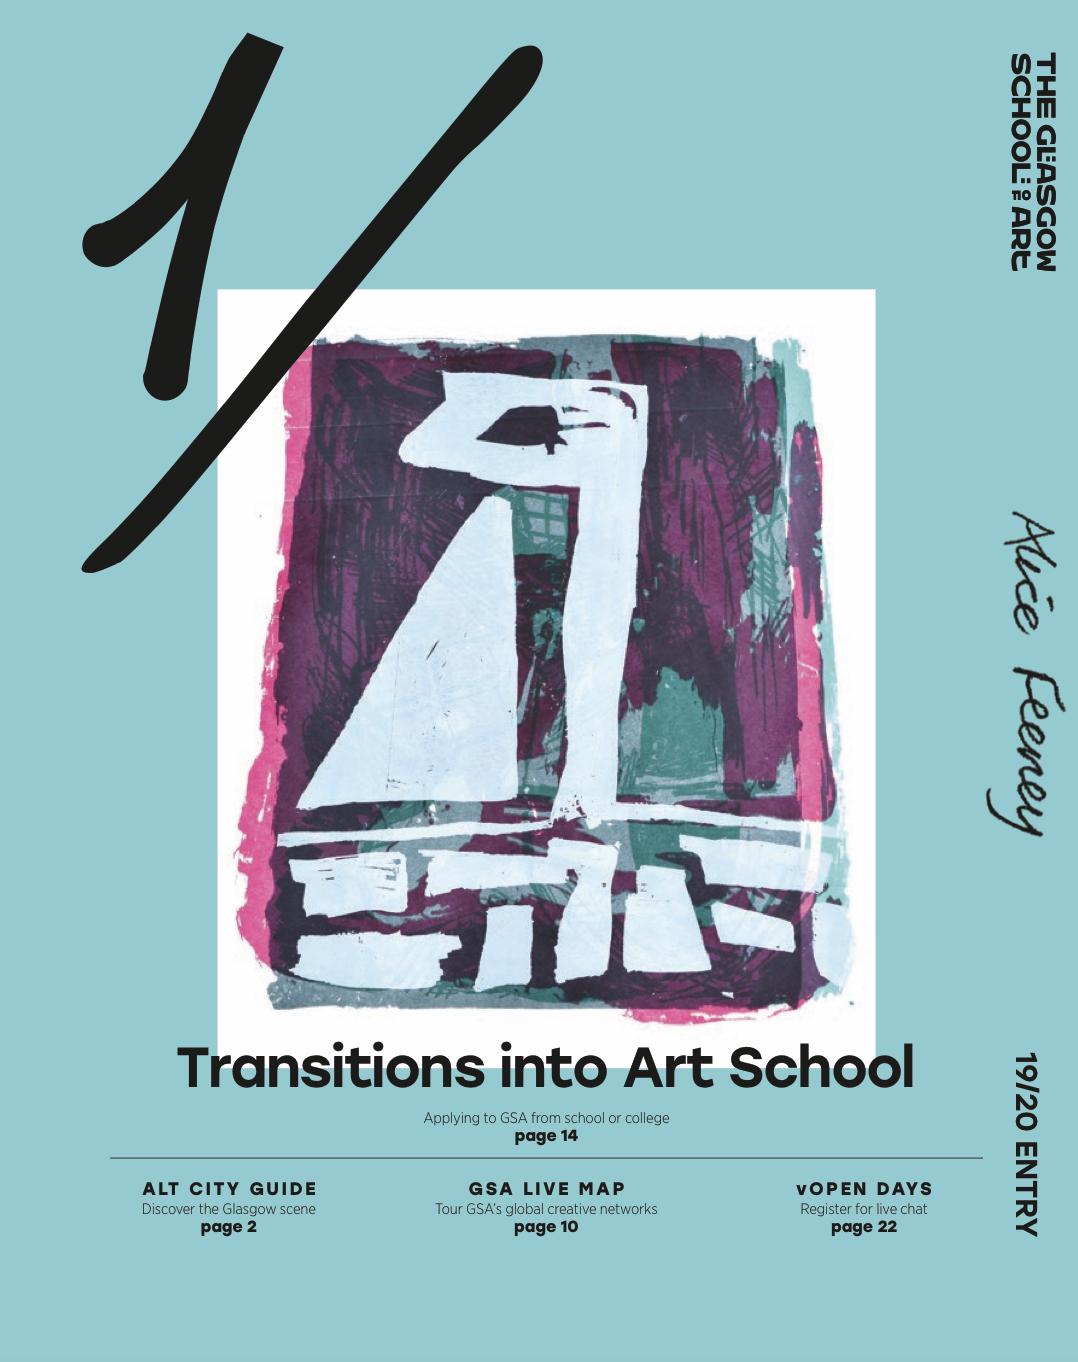 Transitions into Art School